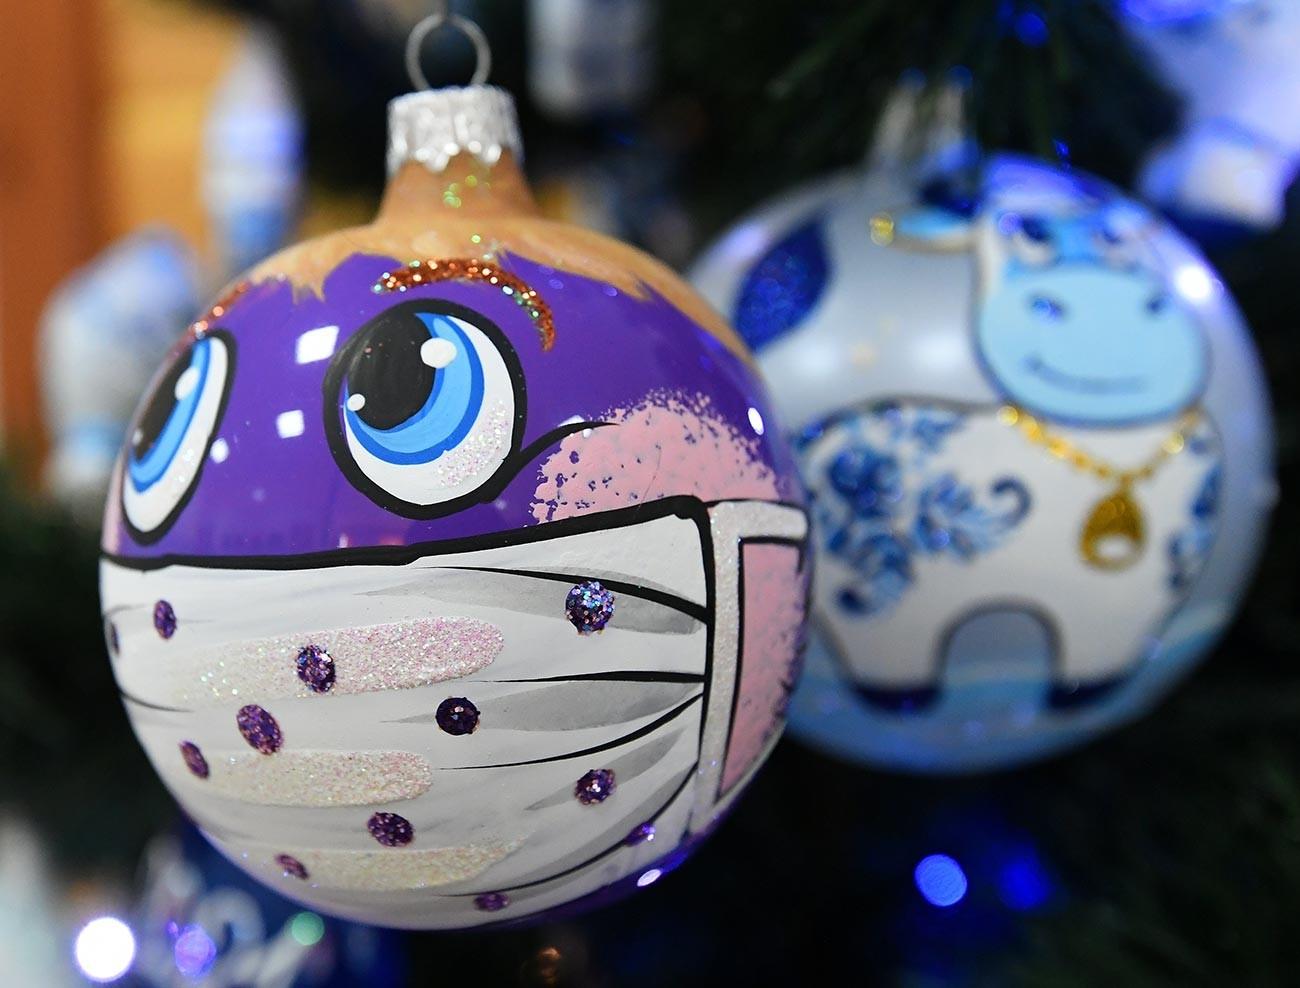 Ročno poslikane steklene kroglice za novoletno jelko v tovarni igrač Birjusinka v Krasnojarsku.